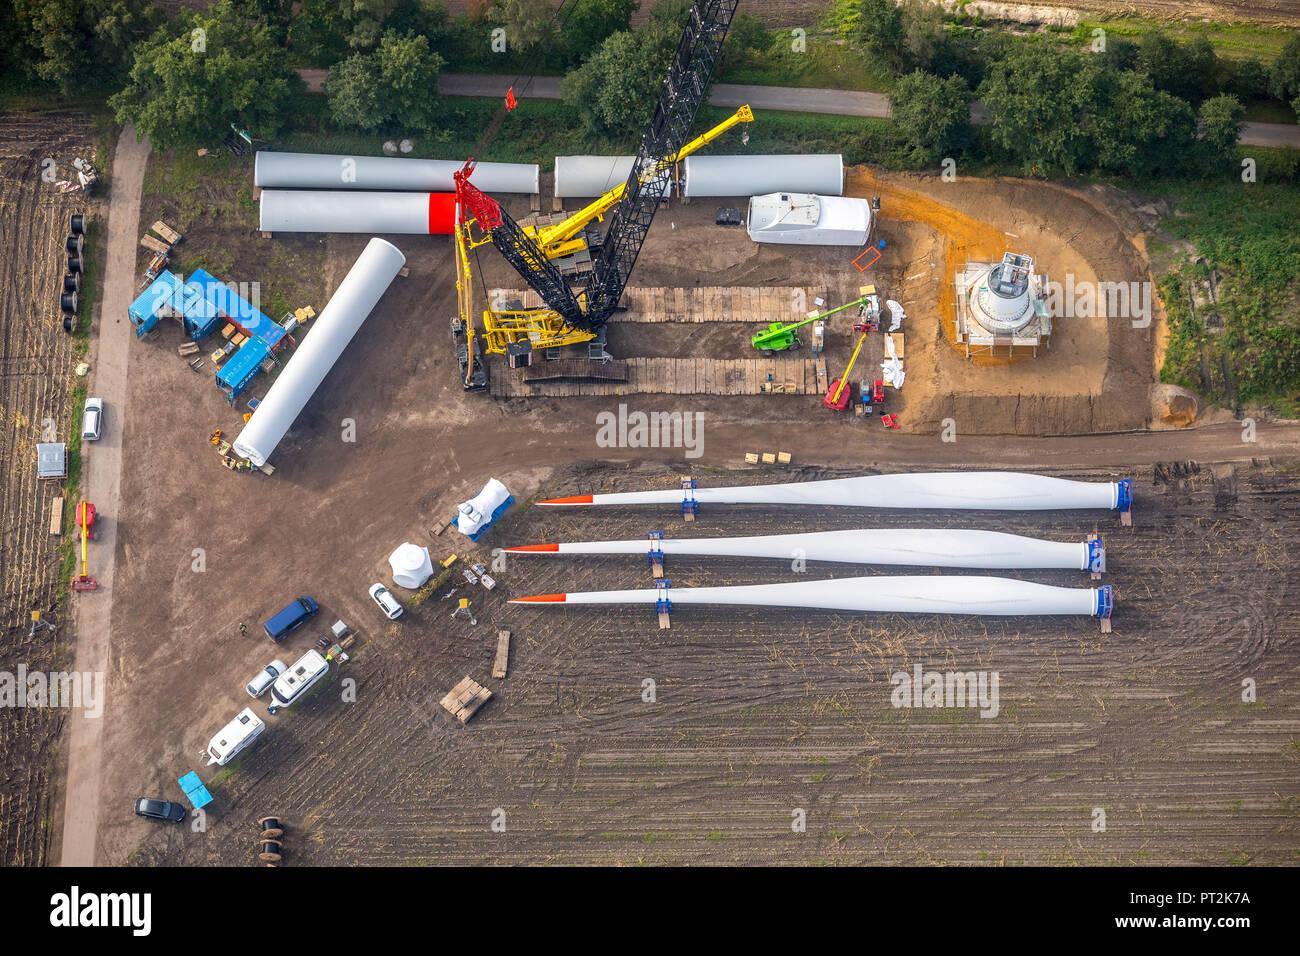 in Schermbeck on the city border to Dorsten arising wind power plants, alternative energy, renewable energy, wind turbine construction kit, Dorsten, Ruhr area, North Rhine-Westphalia, Germany - Stock Image